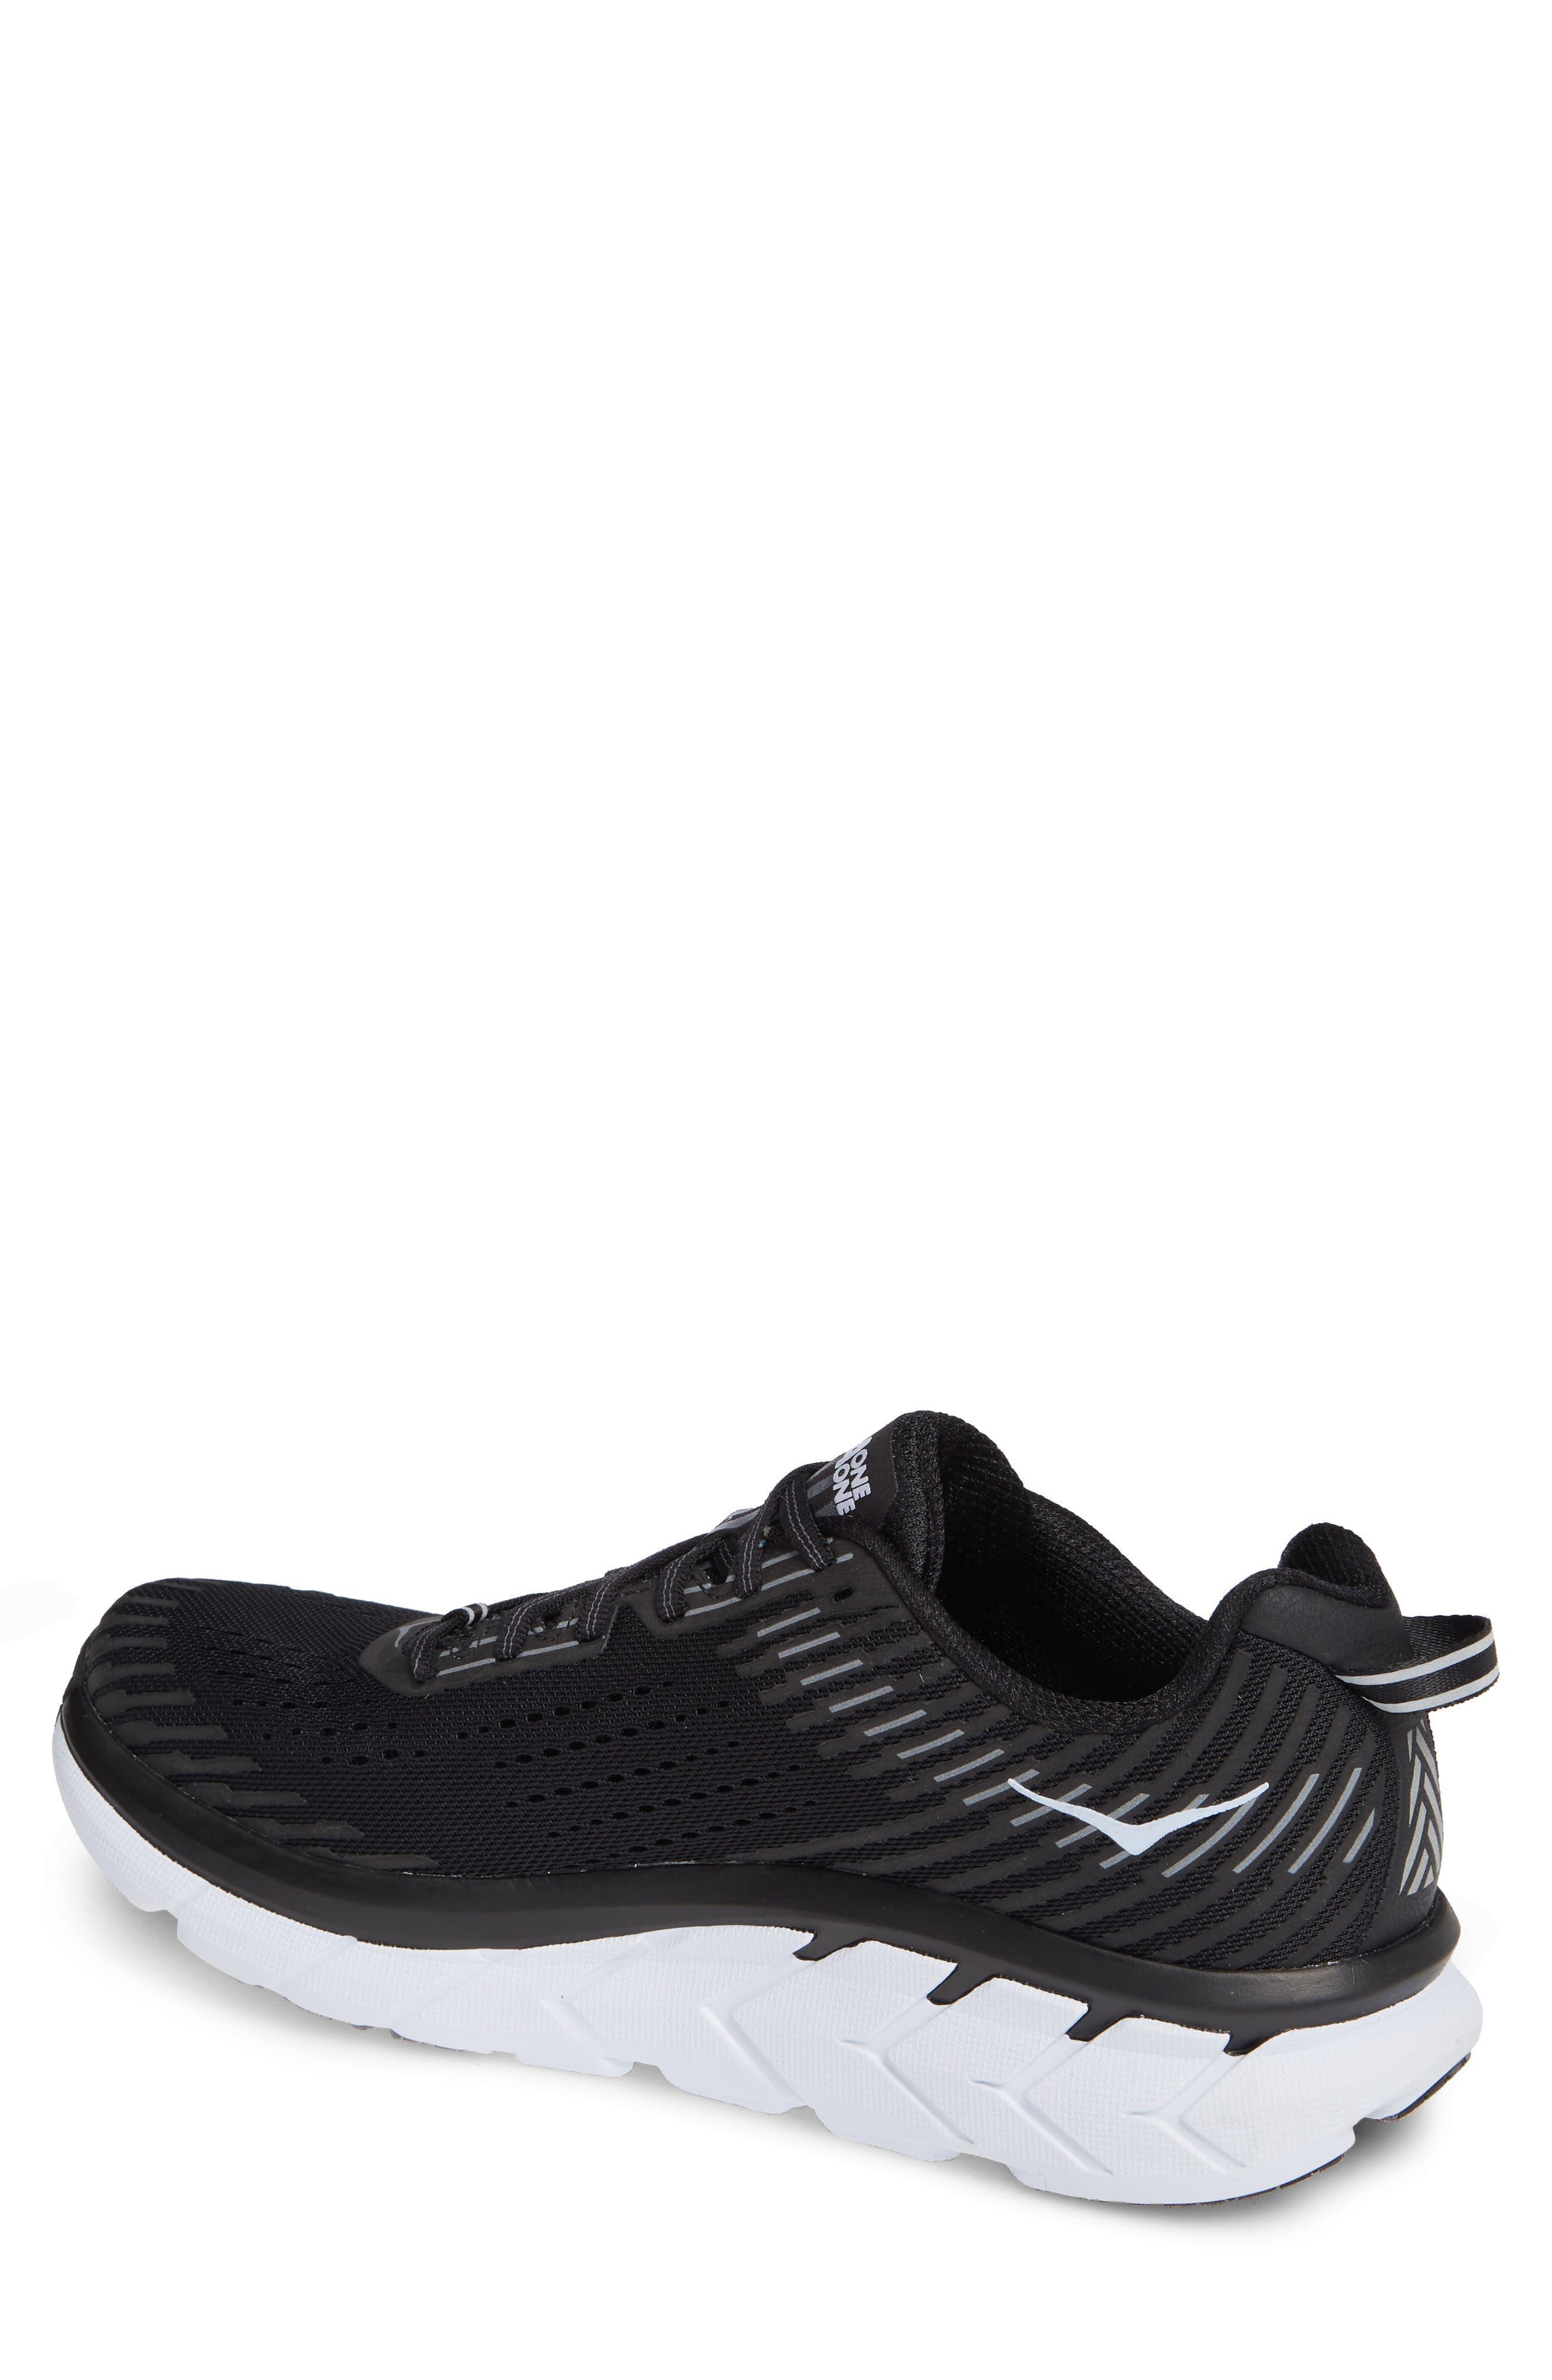 Clifton 5 Running Shoe,                             Alternate thumbnail 2, color,                             BLACK/ WHITE